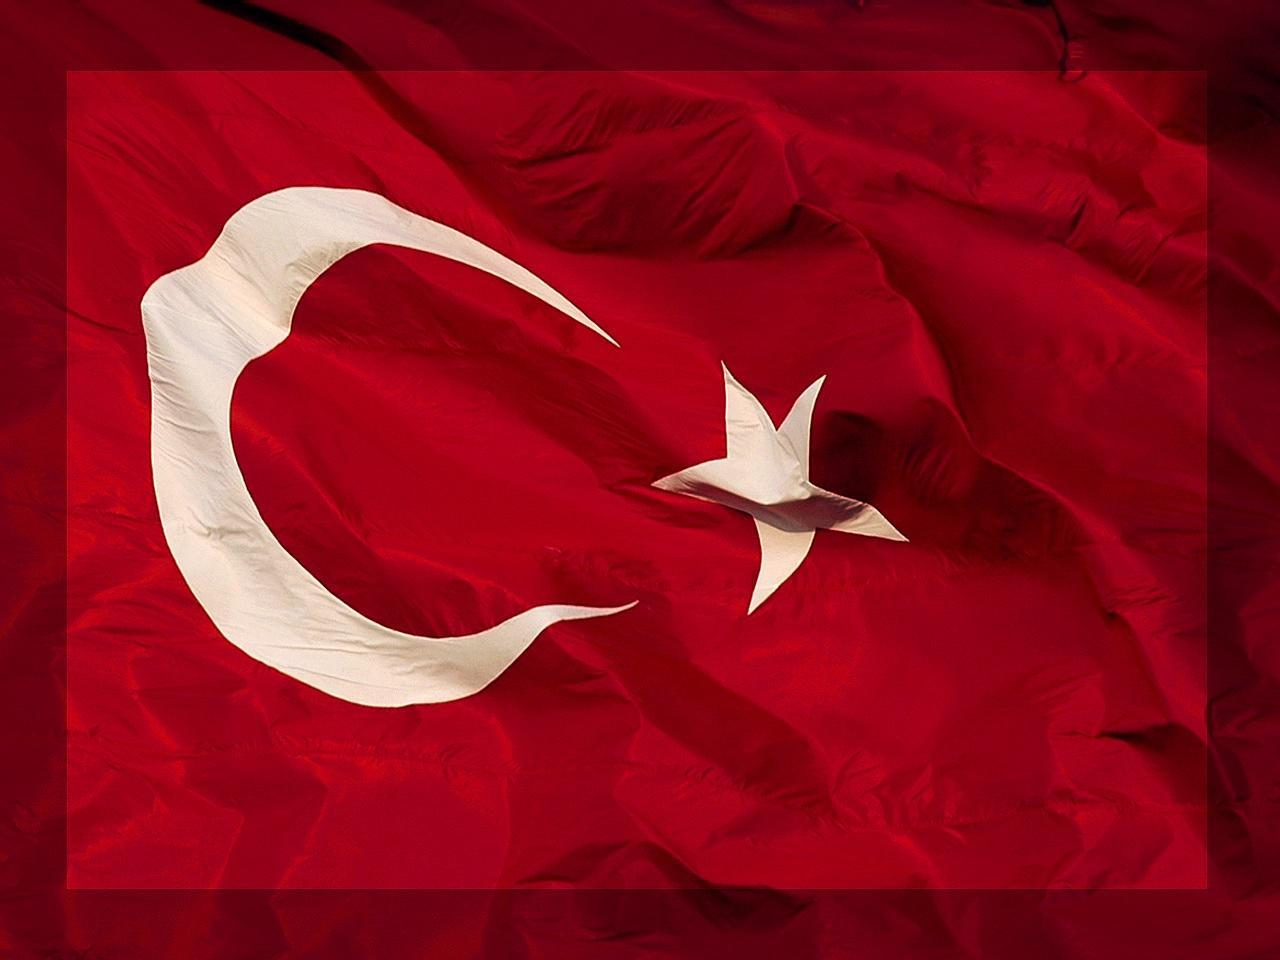 güzel türk bayrağı